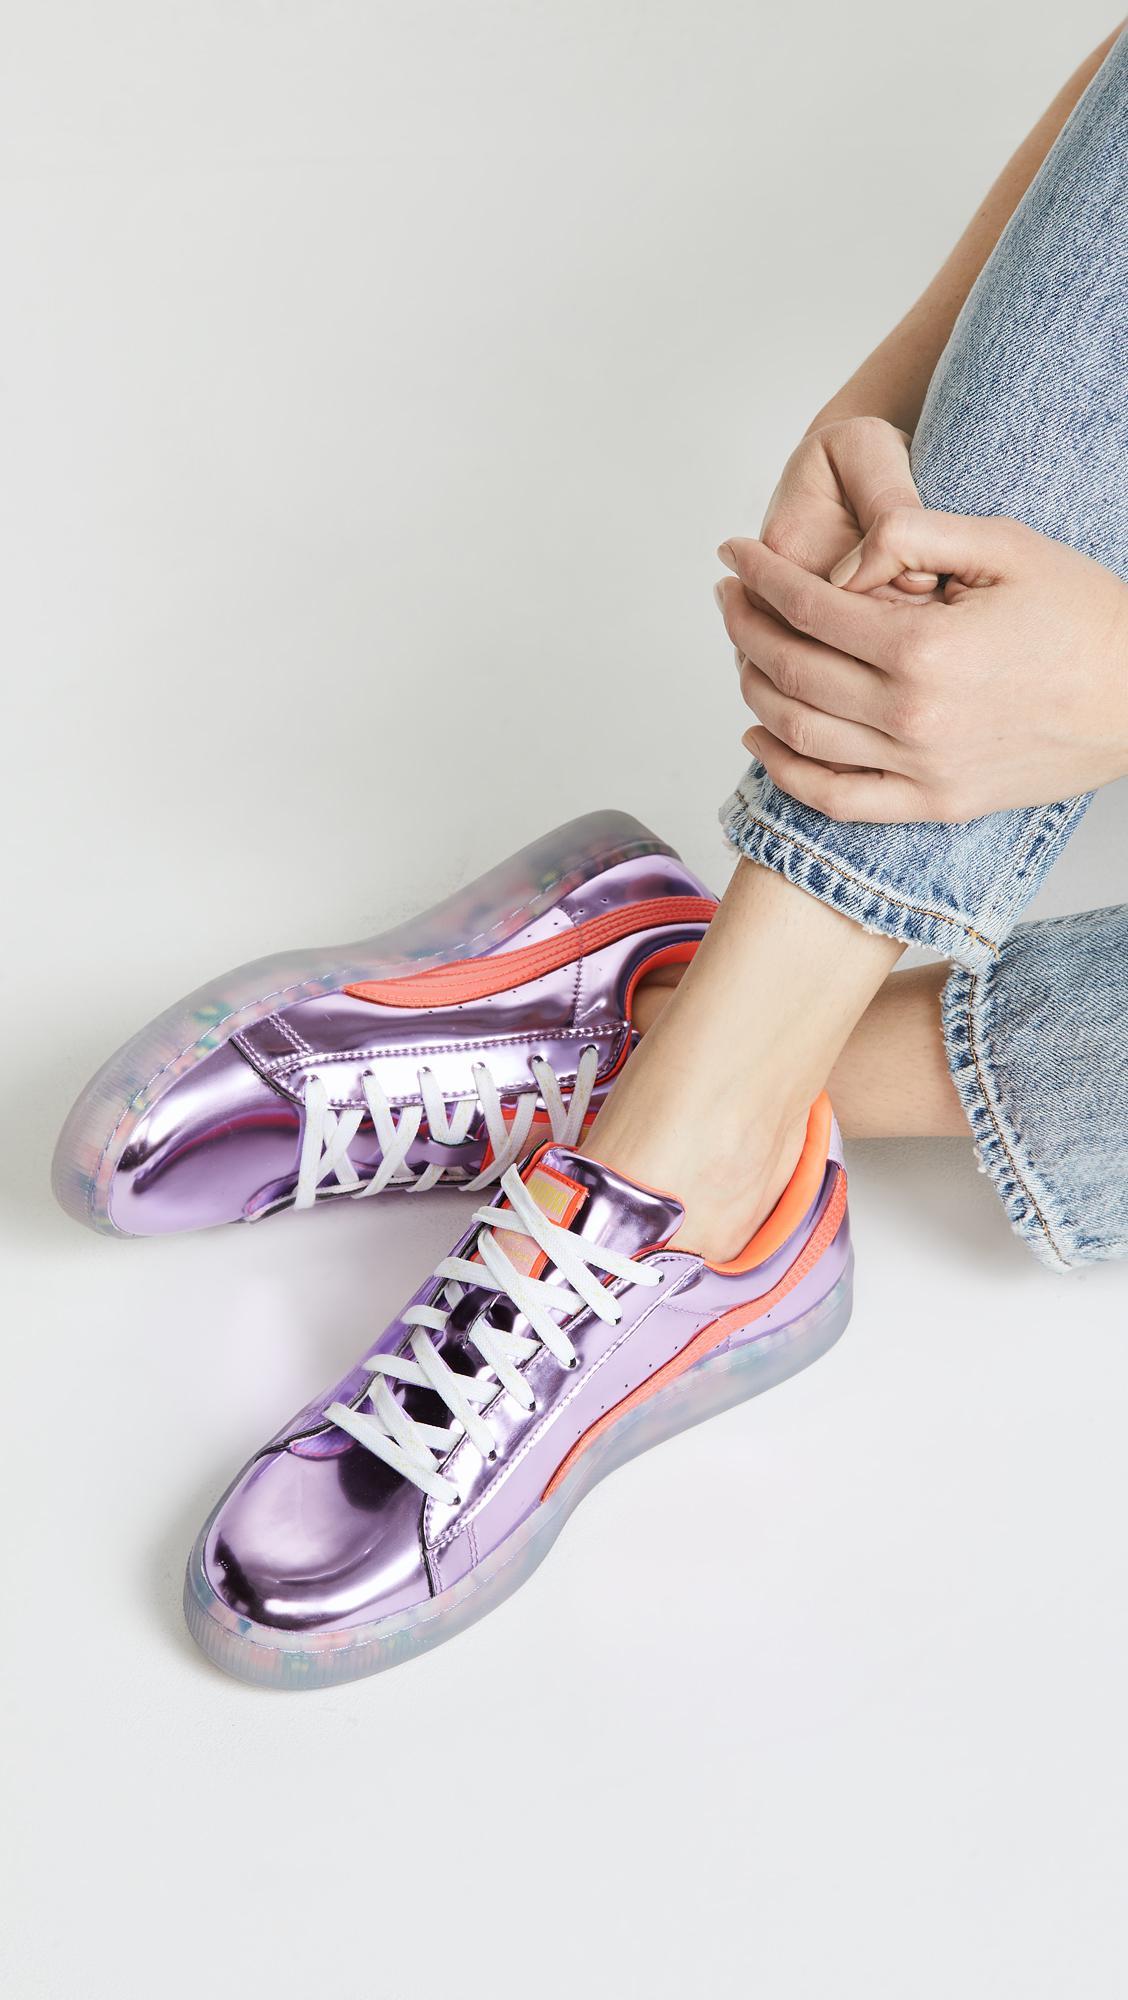 dd9c210b1ba Lyst - PUMA X Sophia Webster Basket Candy Princess Sneakers in Pink